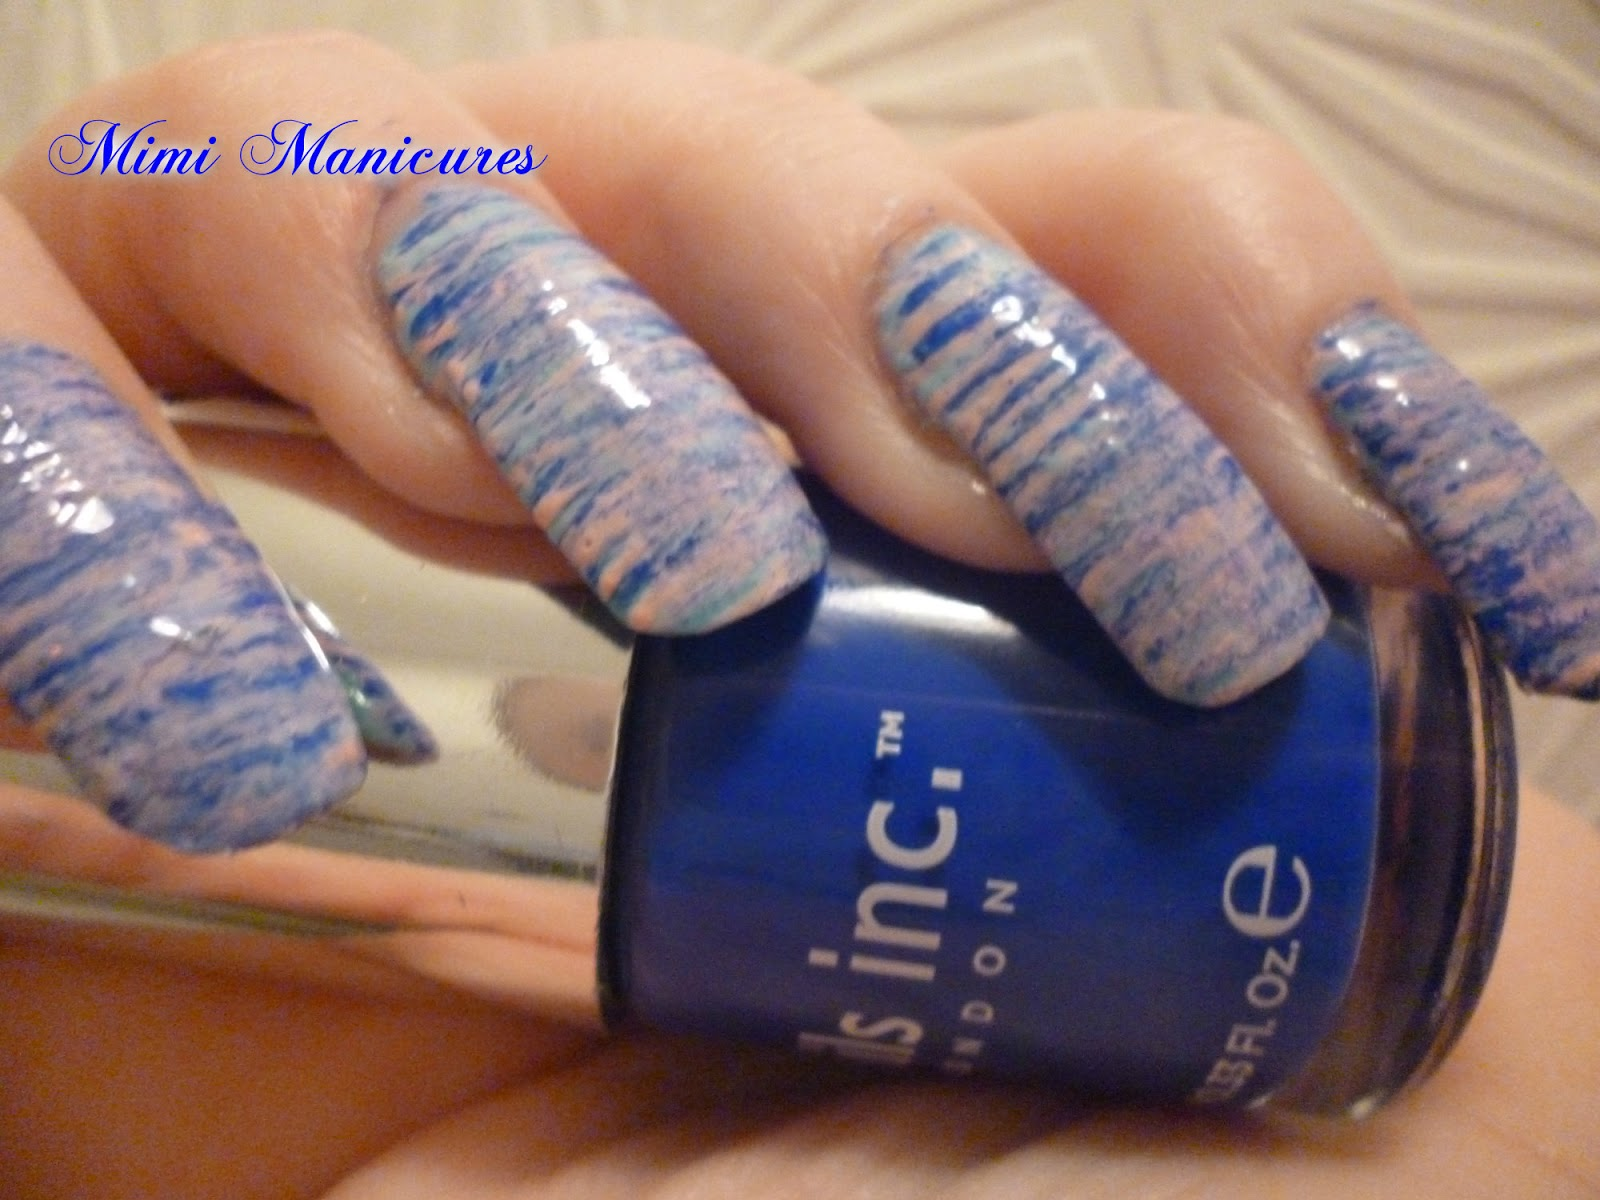 my adventures in nail polish: FFF fan brush nails